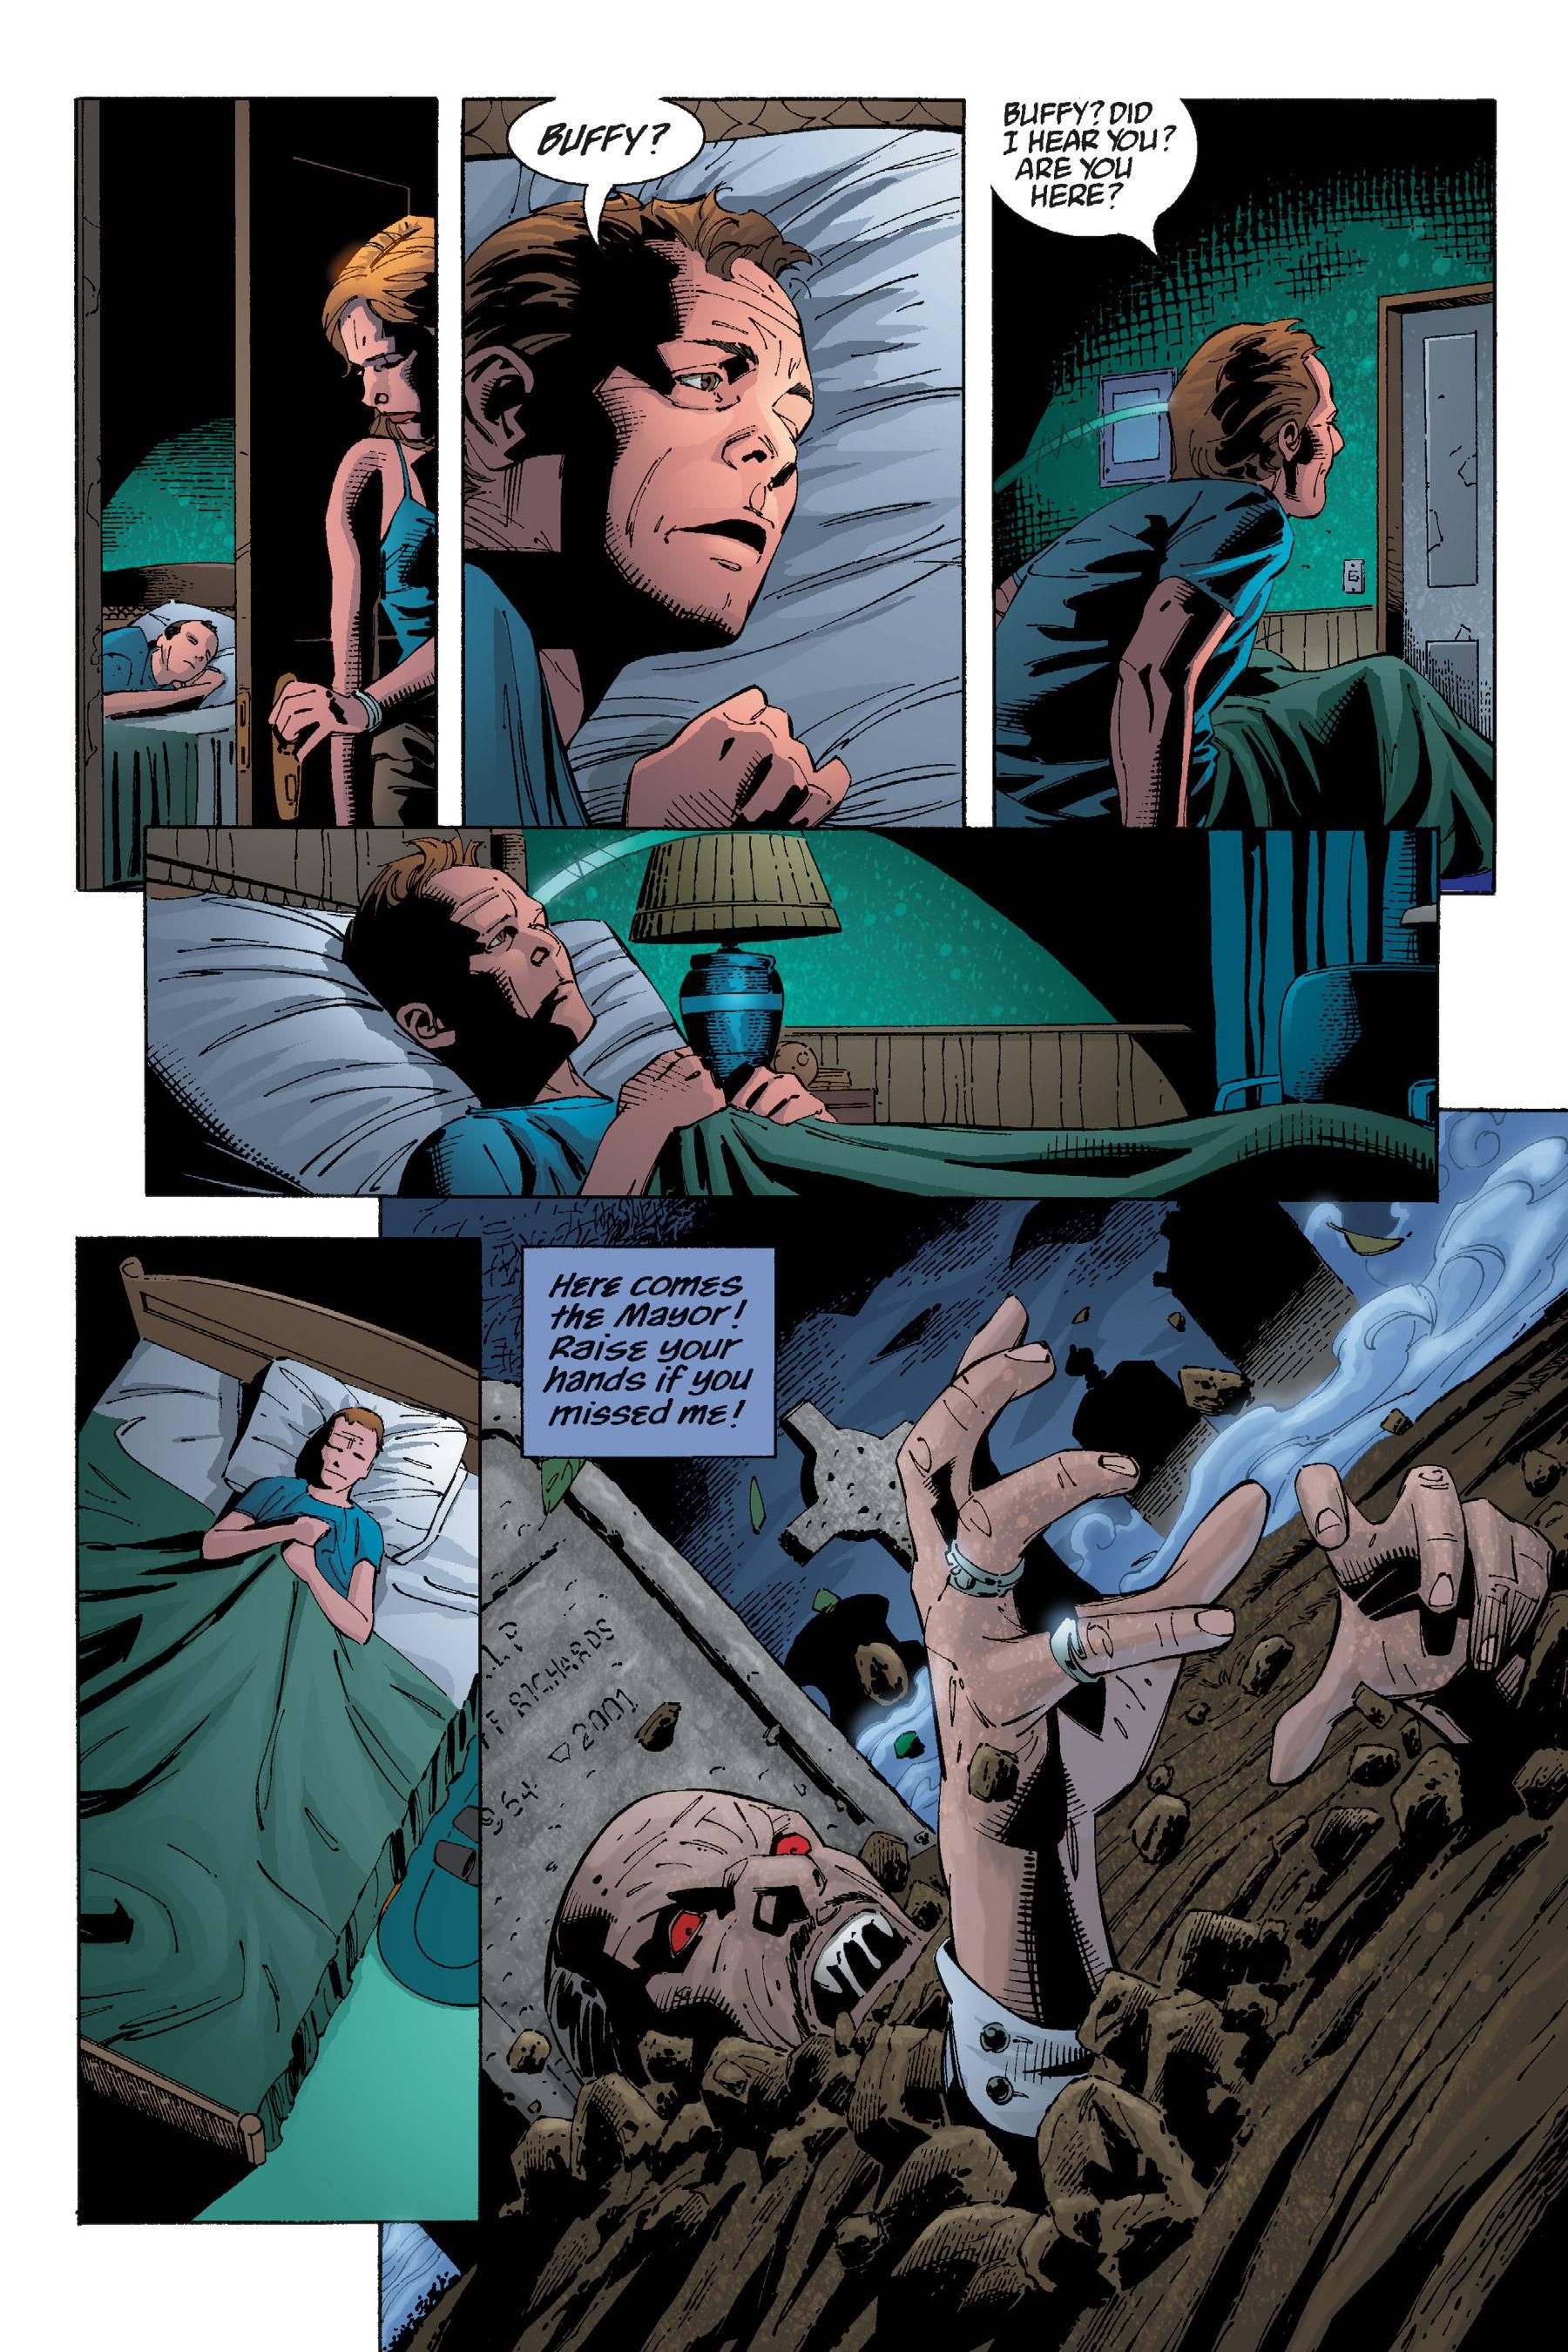 Read online Buffy the Vampire Slayer: Omnibus comic -  Issue # TPB 5 - 56